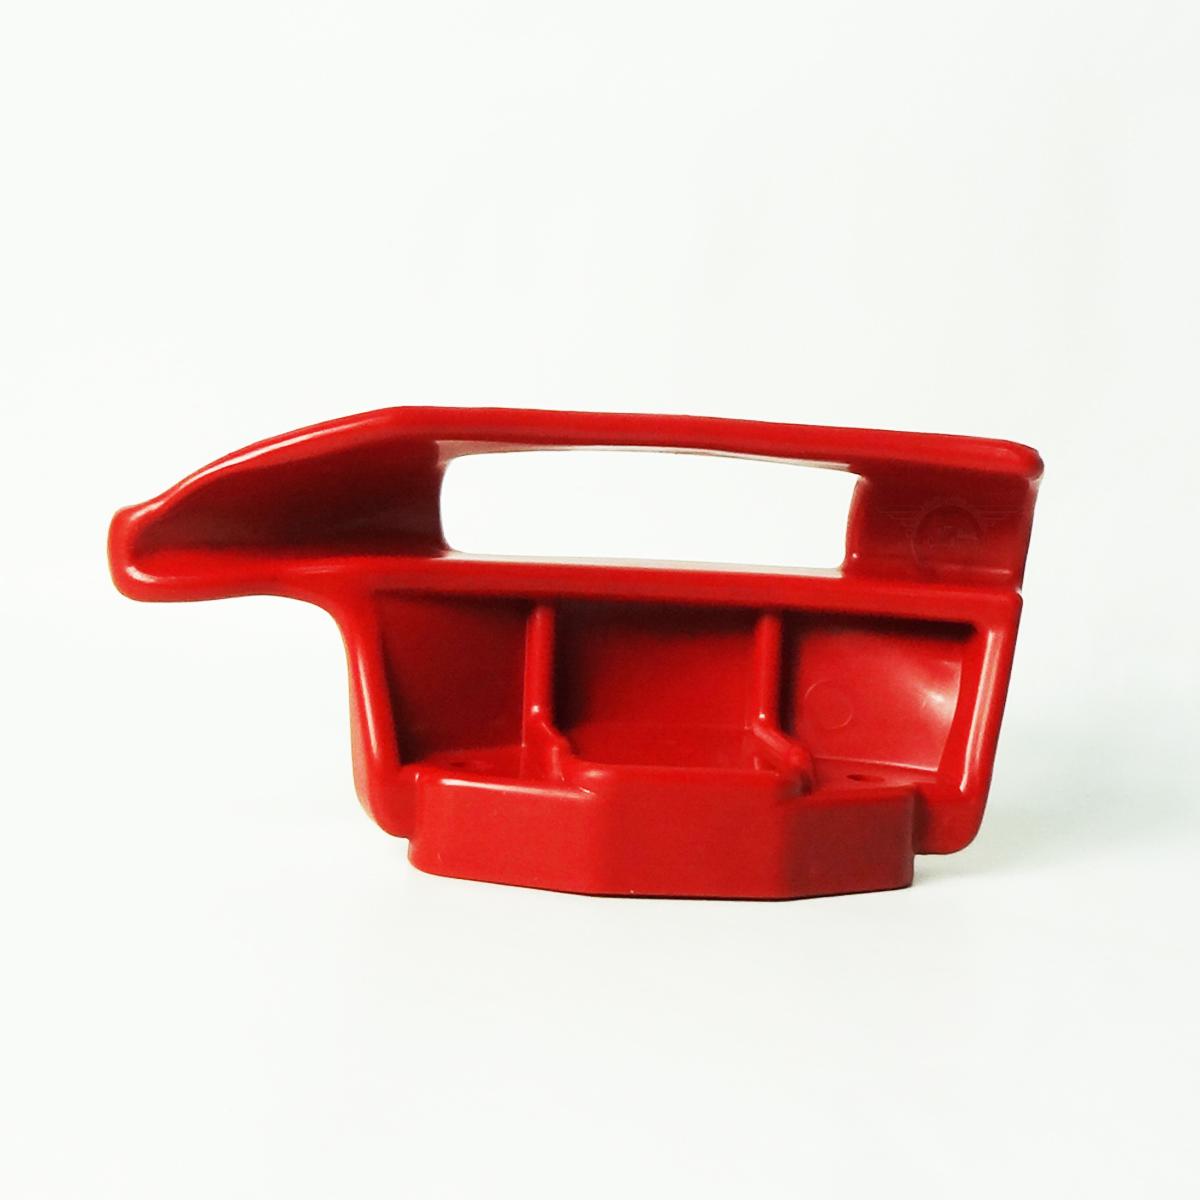 Hunter Tire Changer Red Mount Head Nylon Duck Head Plastic 221-675-2 B